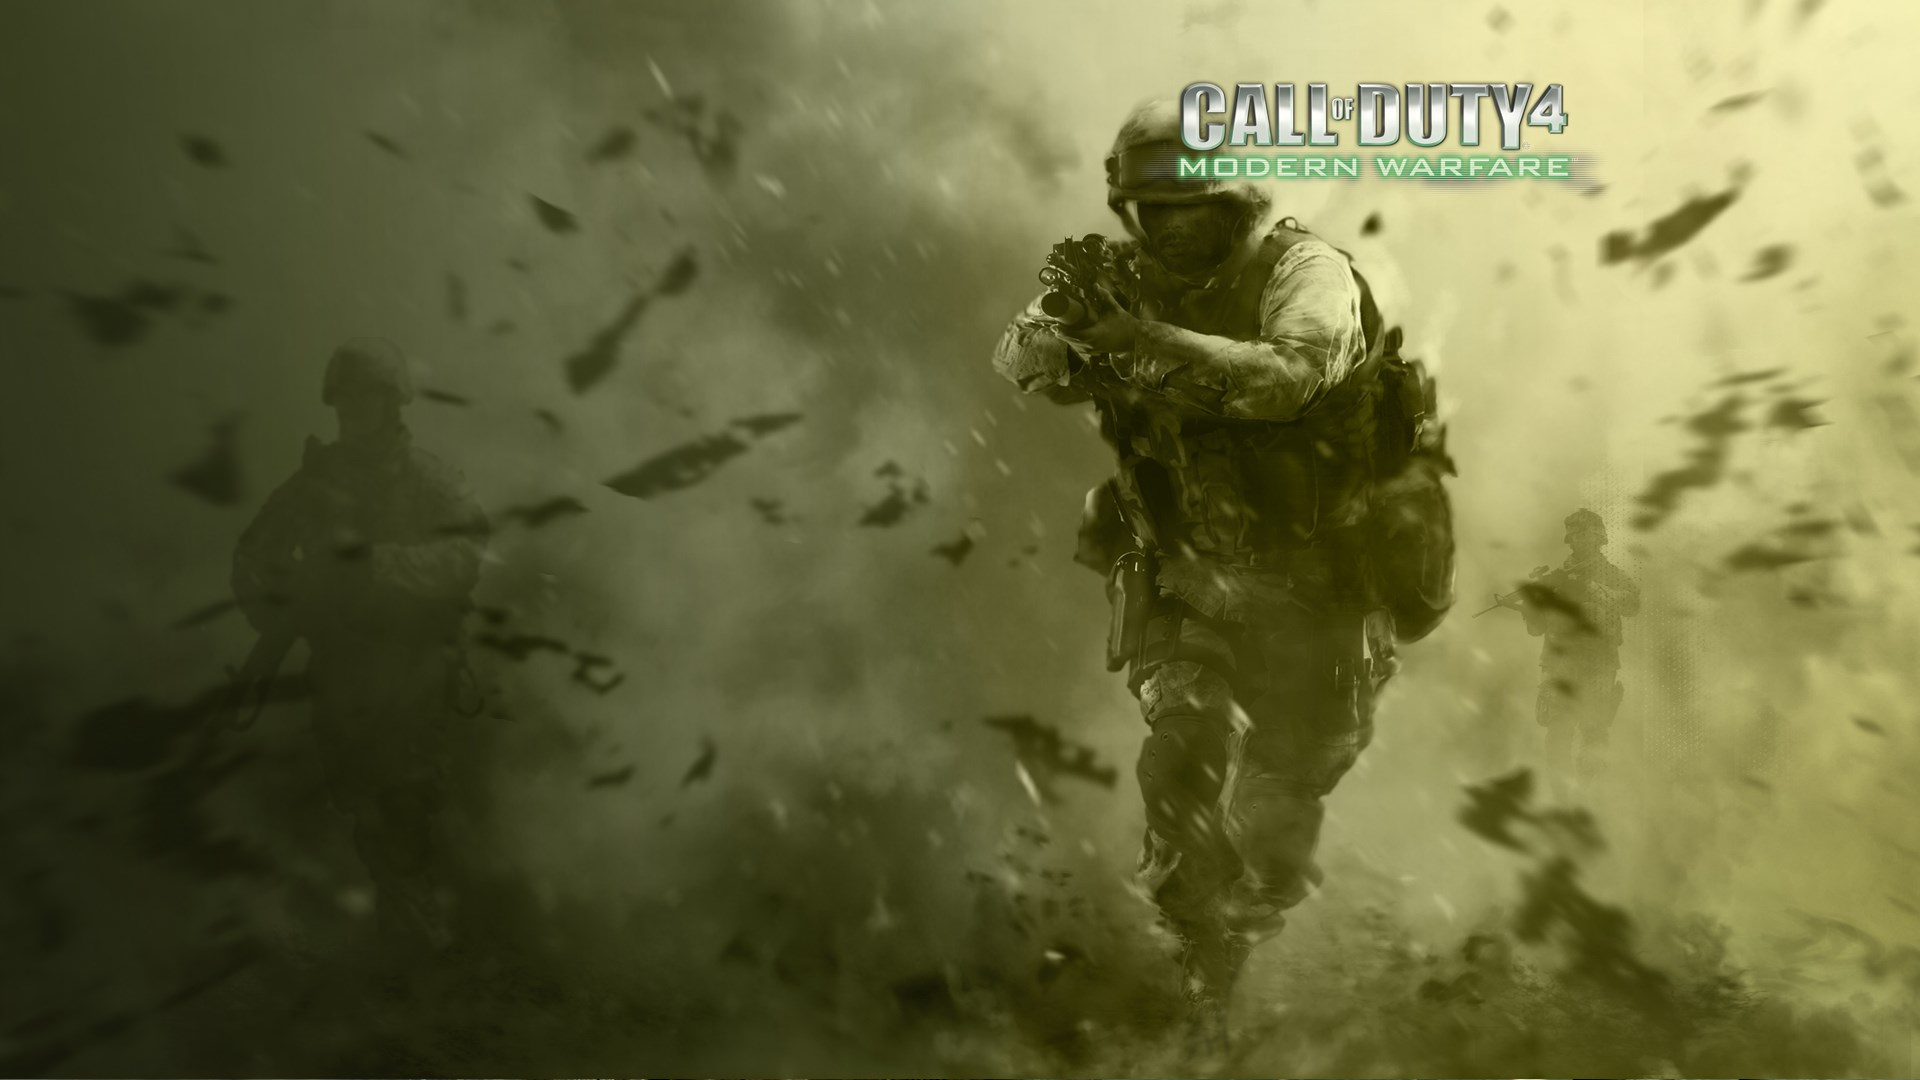 call of duty 4 modern warfare free download full game